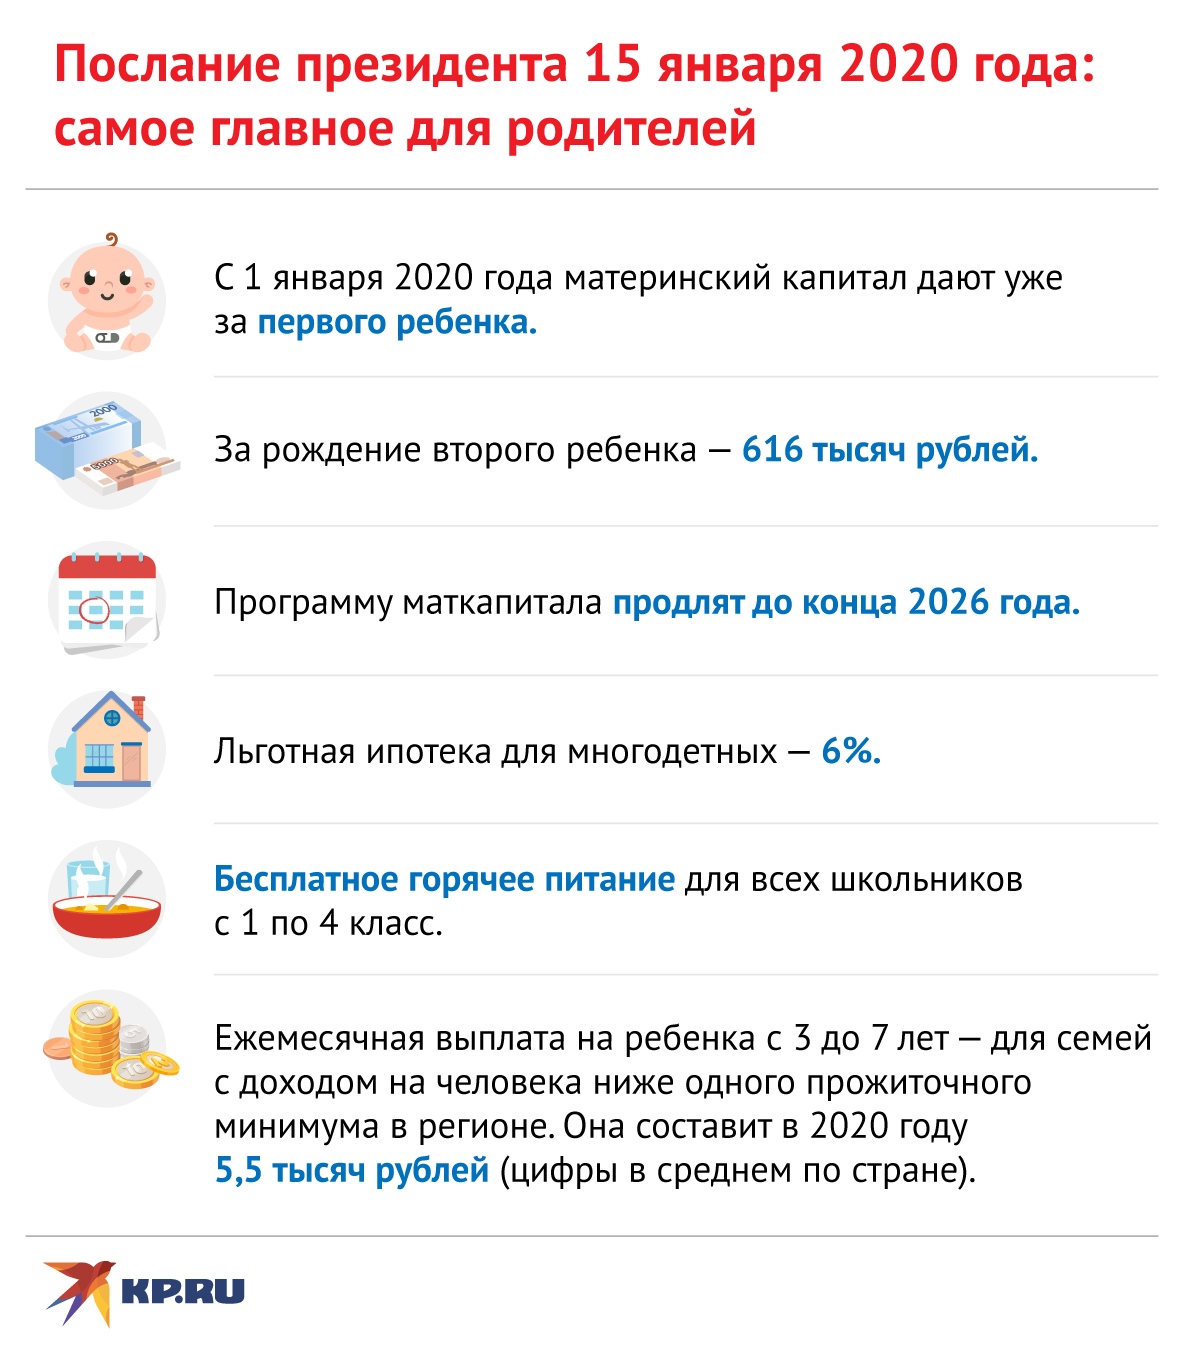 Материнский капитал в 2020 на второго ребенка: сумма, изменения, последние новости